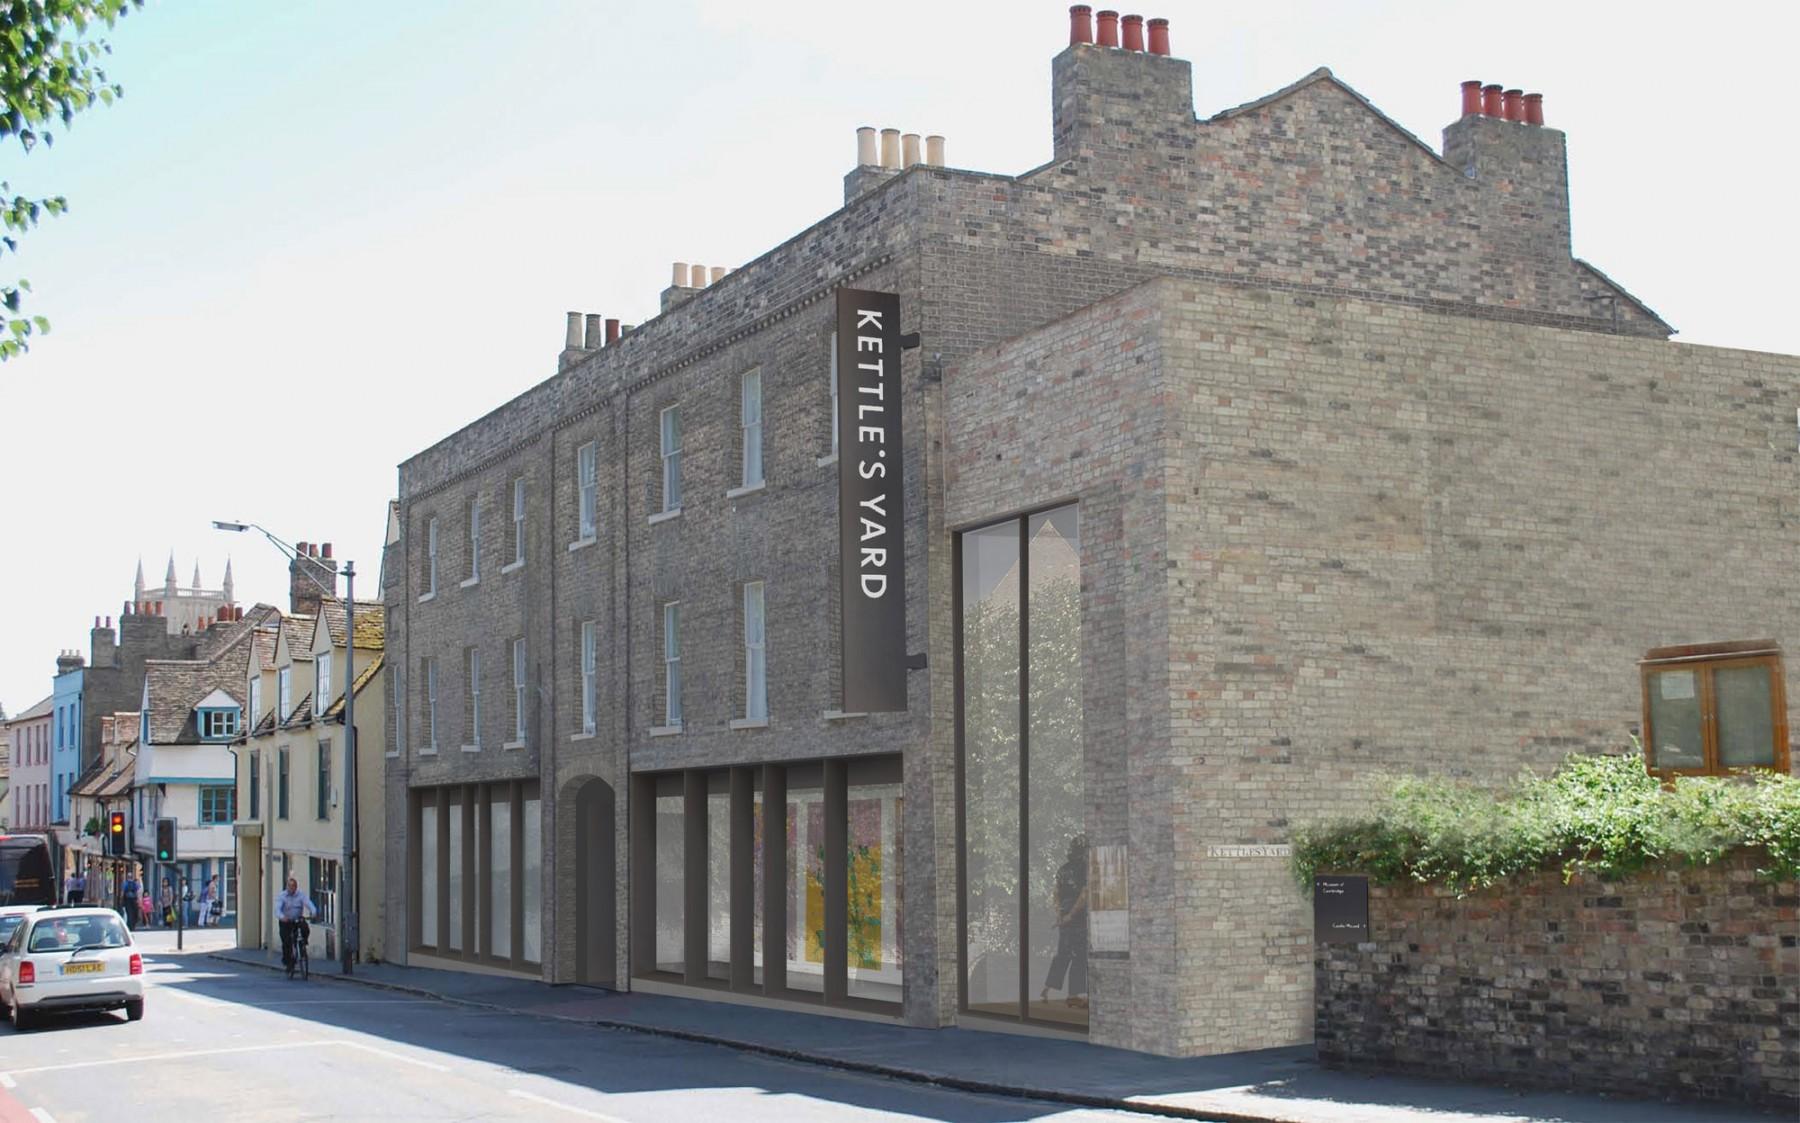 Kettles-yard-jamie-fobert-architects-castle-street-cambridge-street-view